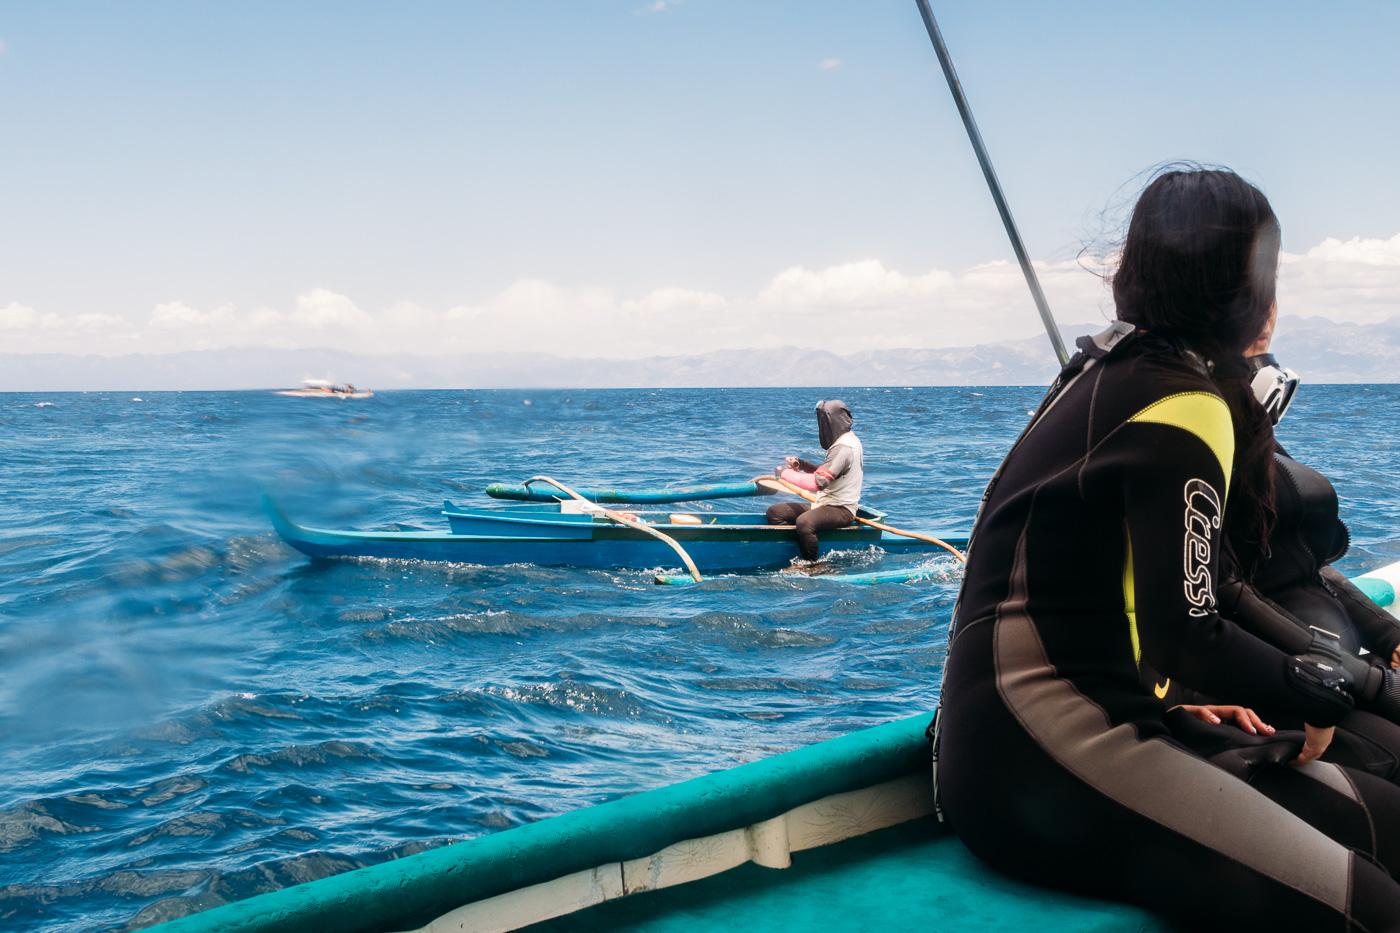 local fishermen of Moalboal Philippines